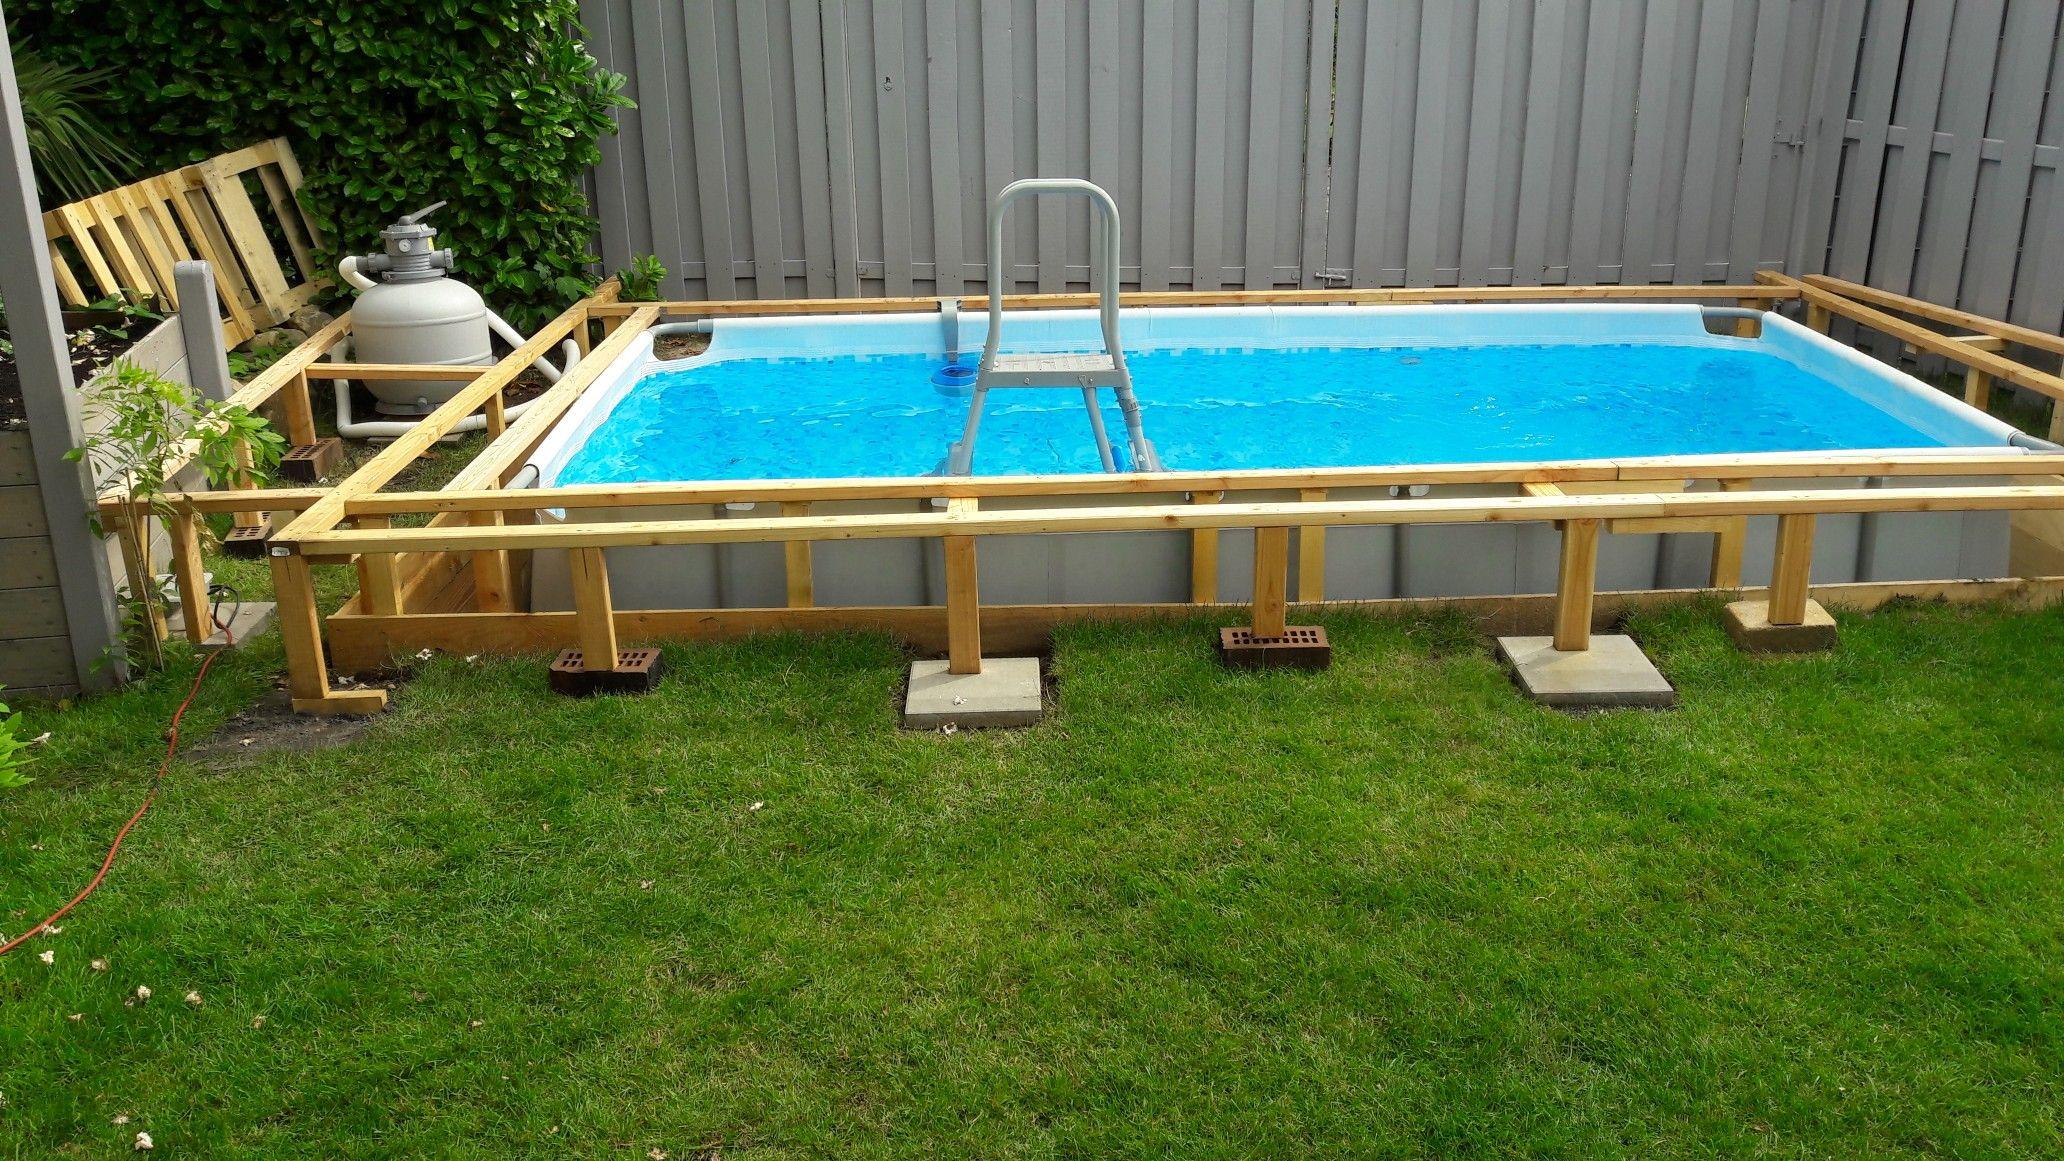 Pin Von Ronny Fenske Auf Pool Selber Bauen Gartenpools Pool Rechteckig Eigenen Pool Bauen